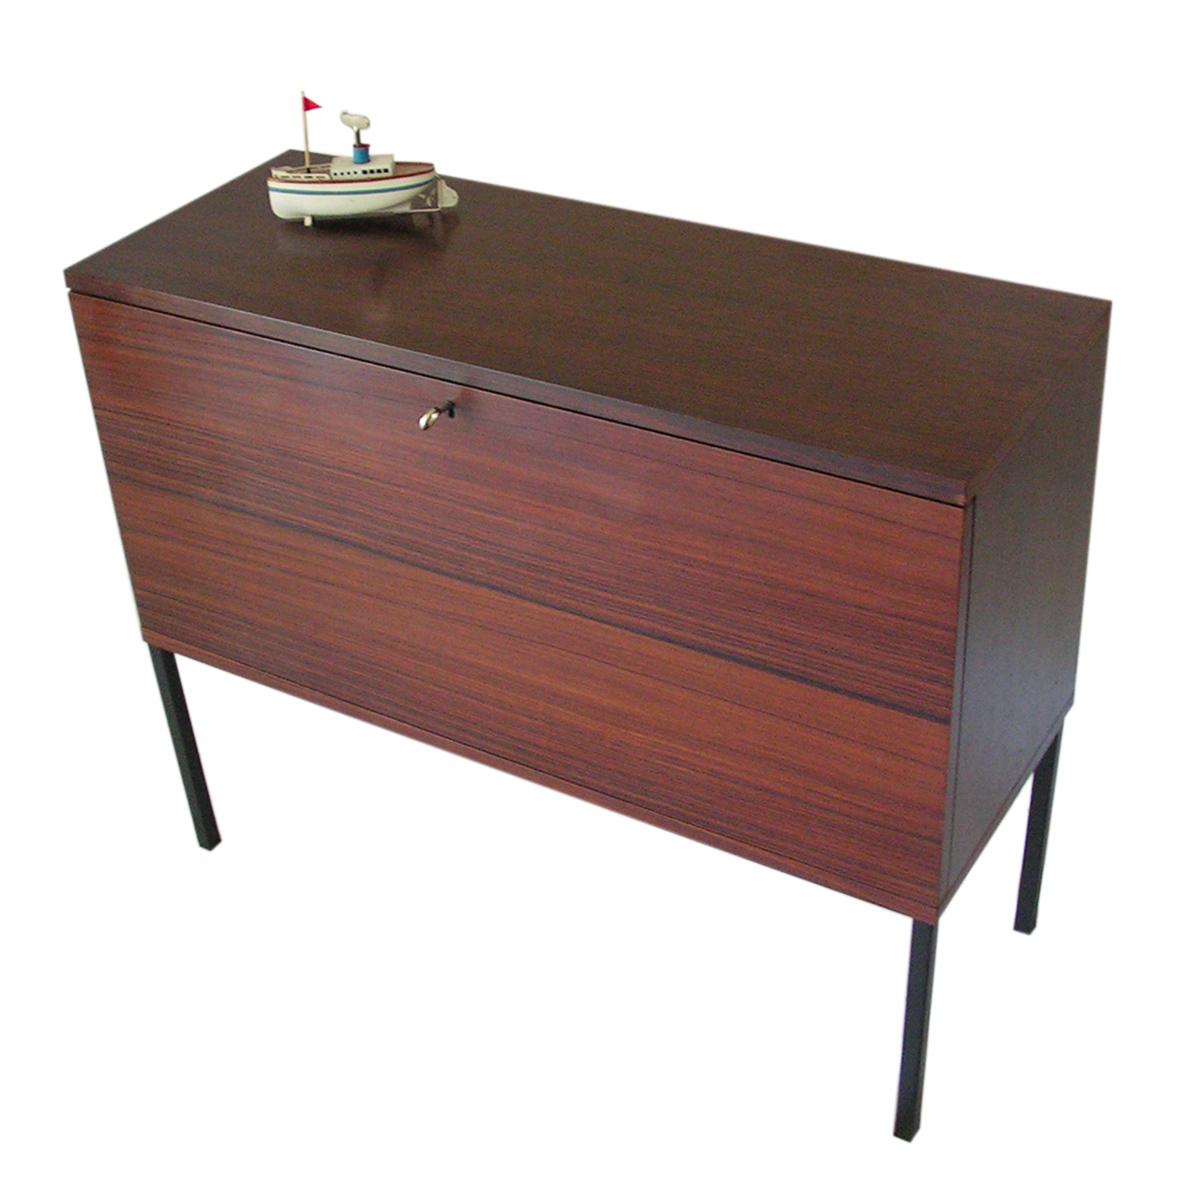 sideboard-cocktail-dry-bar-victoria-rosewood-swiss-design-baar